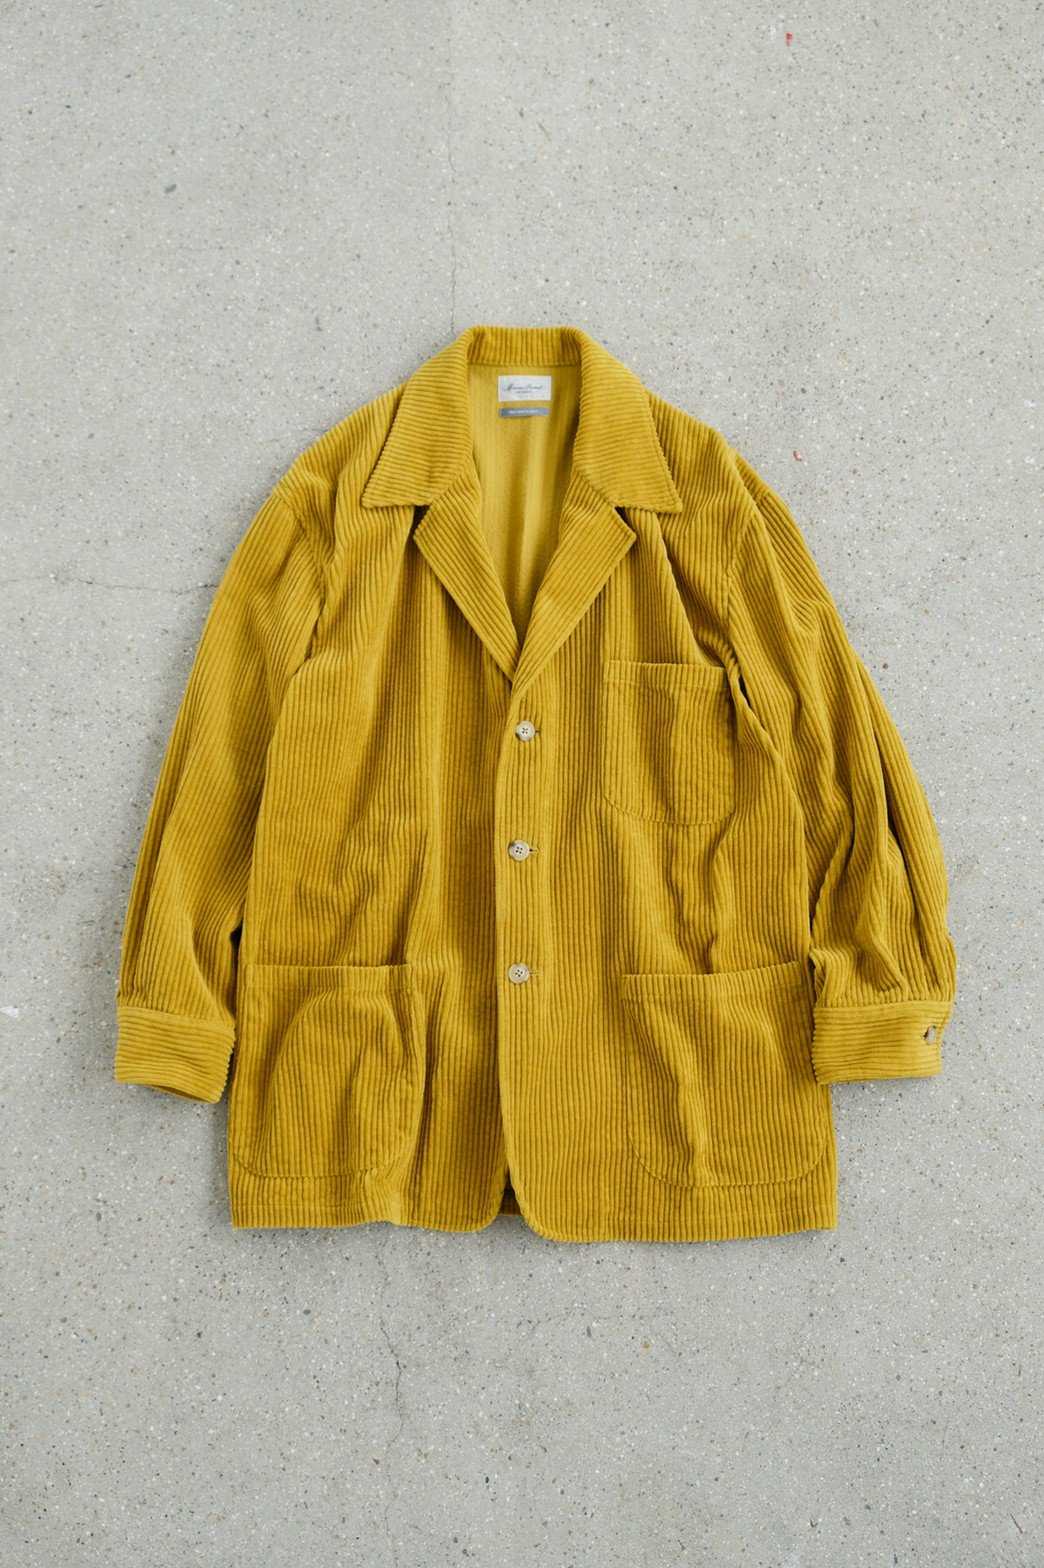 Marvine Pontiak Shirt Makers / 3 Button Shirt Jacket